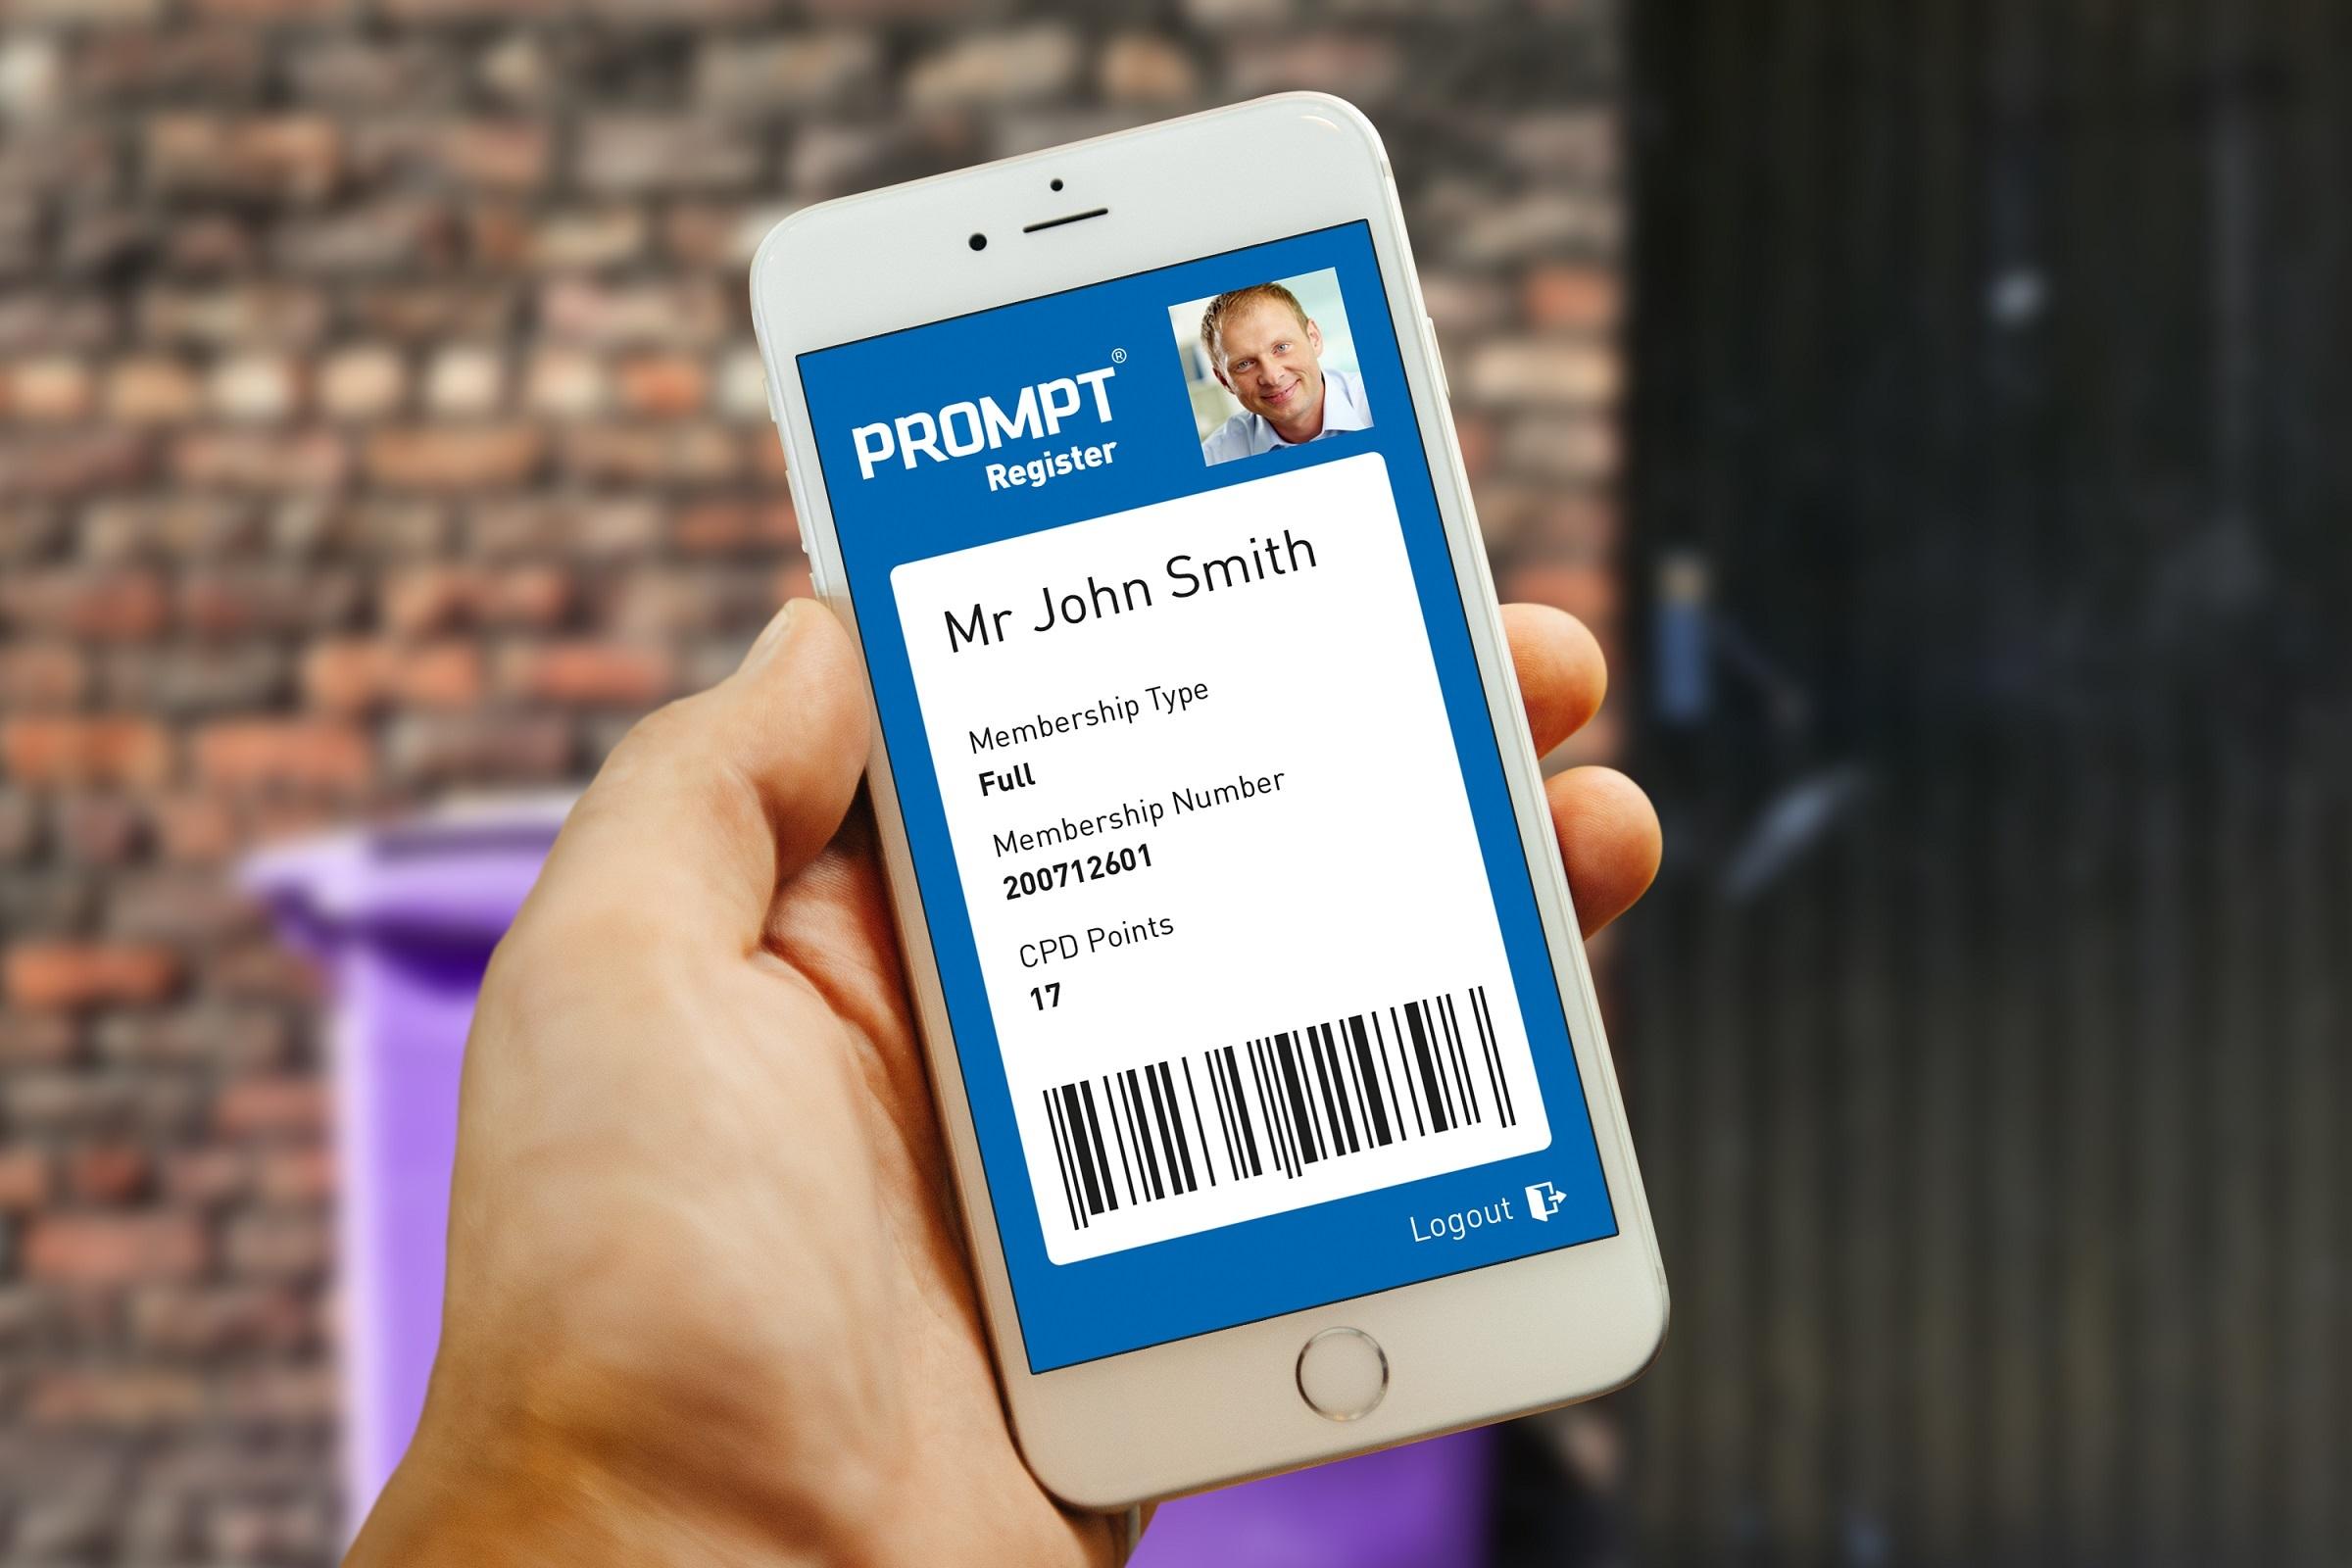 Digital ID card boost for BASIS PROMPT members